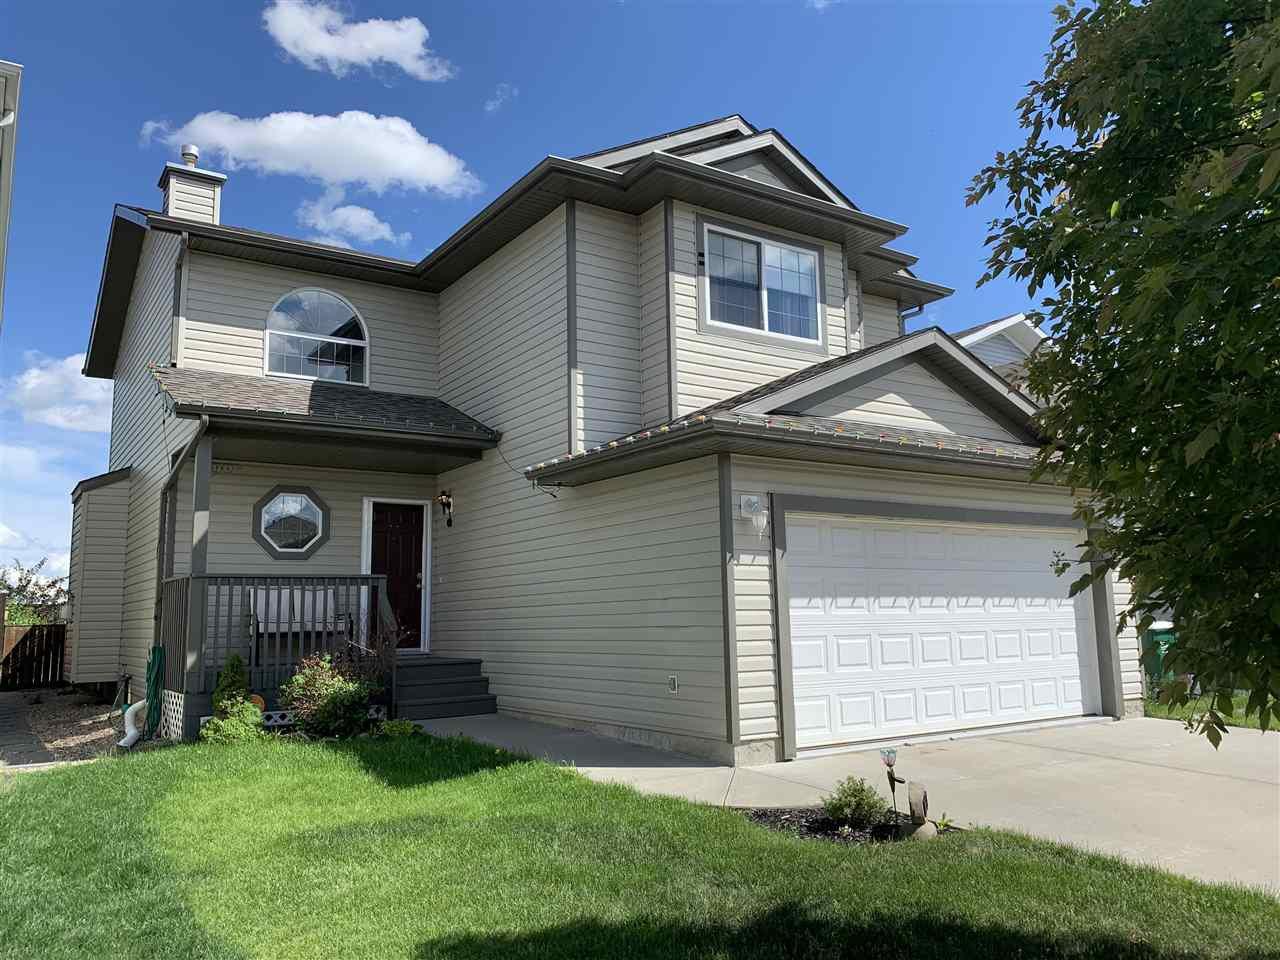 Main Photo: 10513 94 Street: Morinville House for sale : MLS®# E4172446